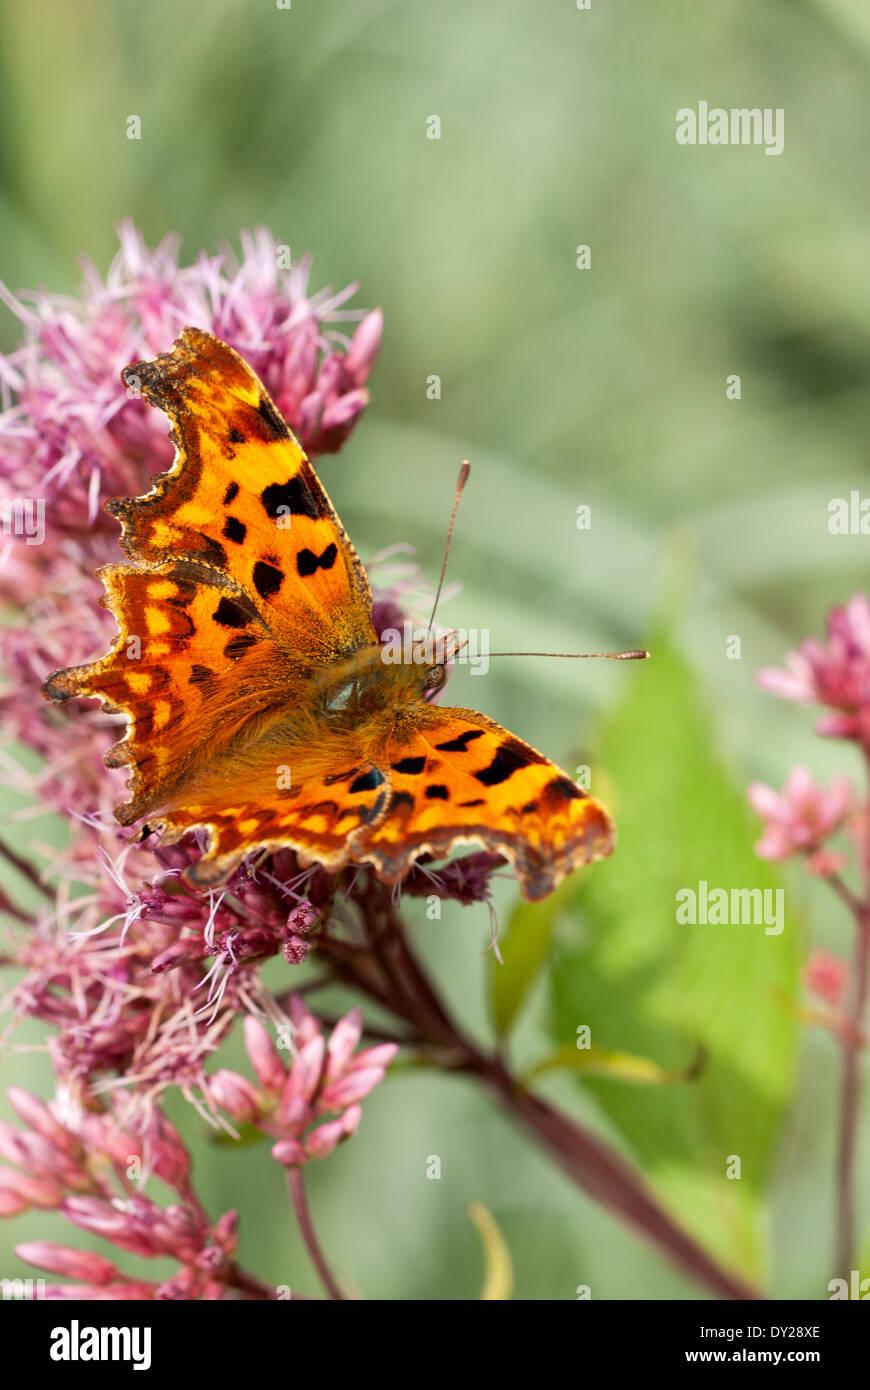 Polygonia c-album, Comma Butterfly on Eupatorium maculatum Atropurpureum Group flower. September. Stock Photo